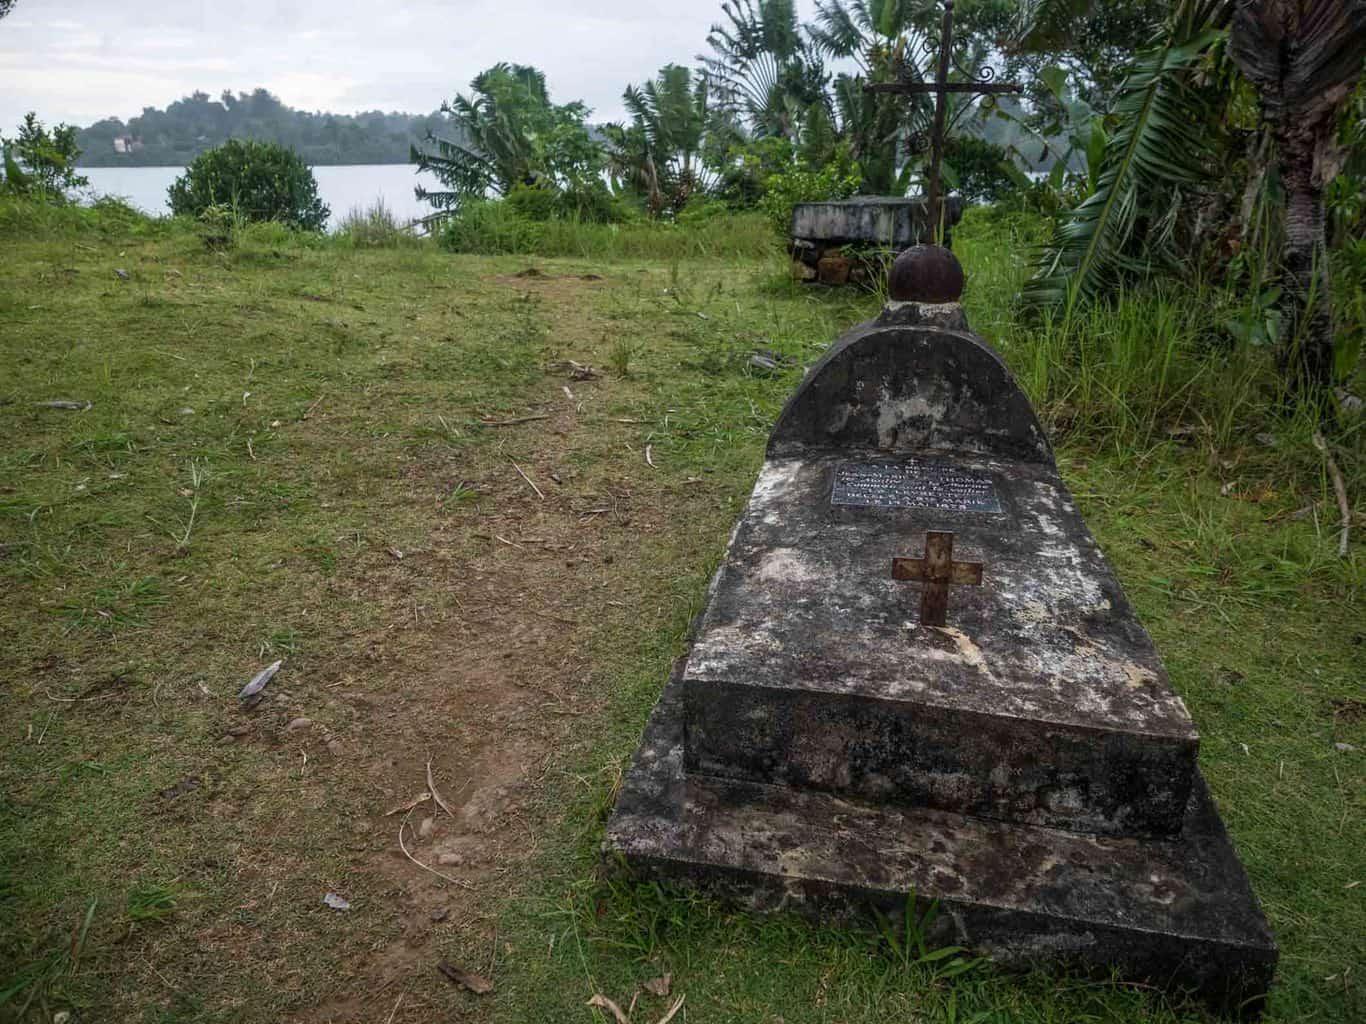 Pirate grave in Madagascar